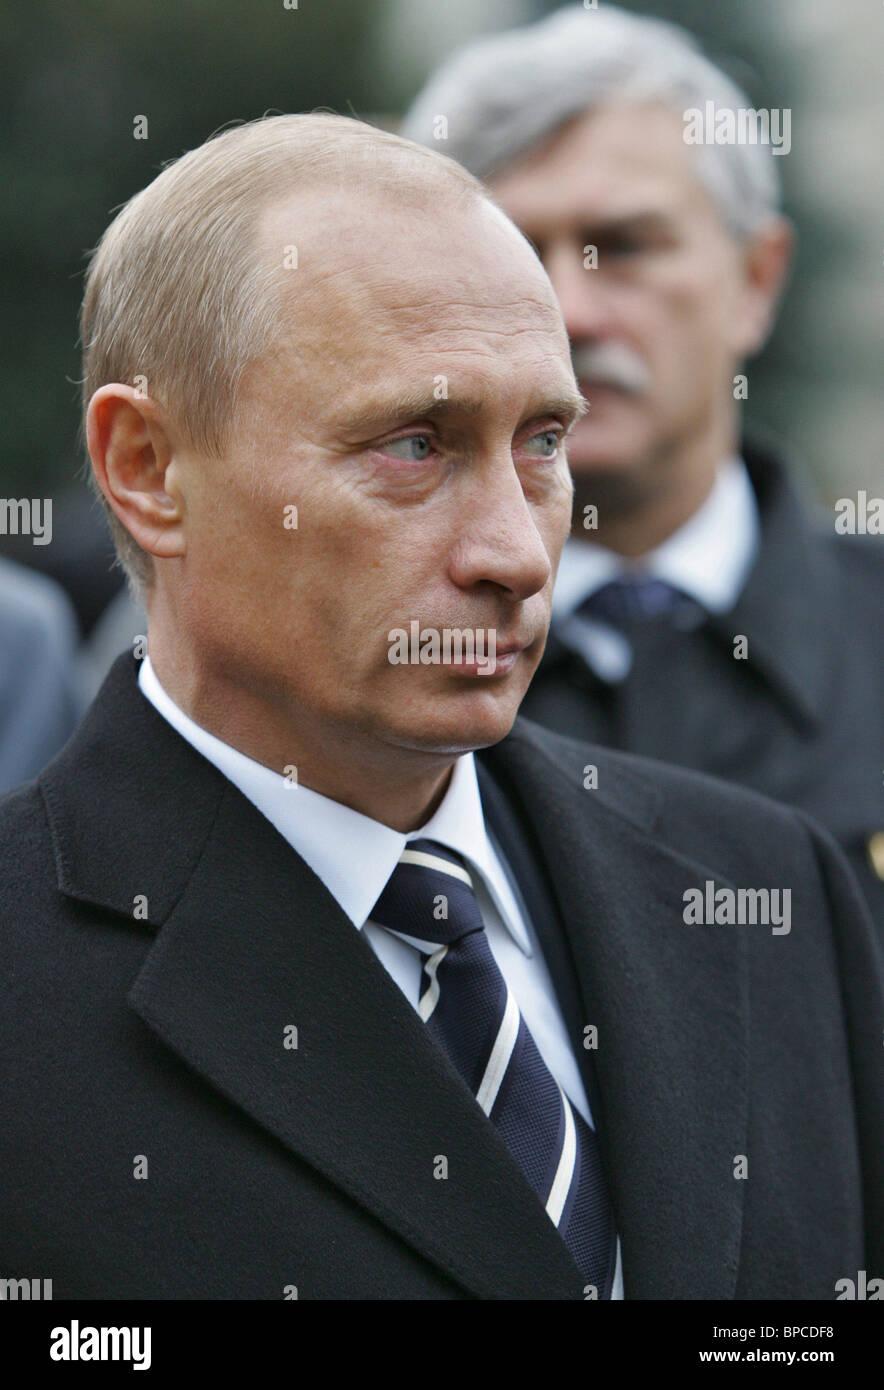 President Vladimir Putin arrives in Yaroslavl for working visit - Stock Image